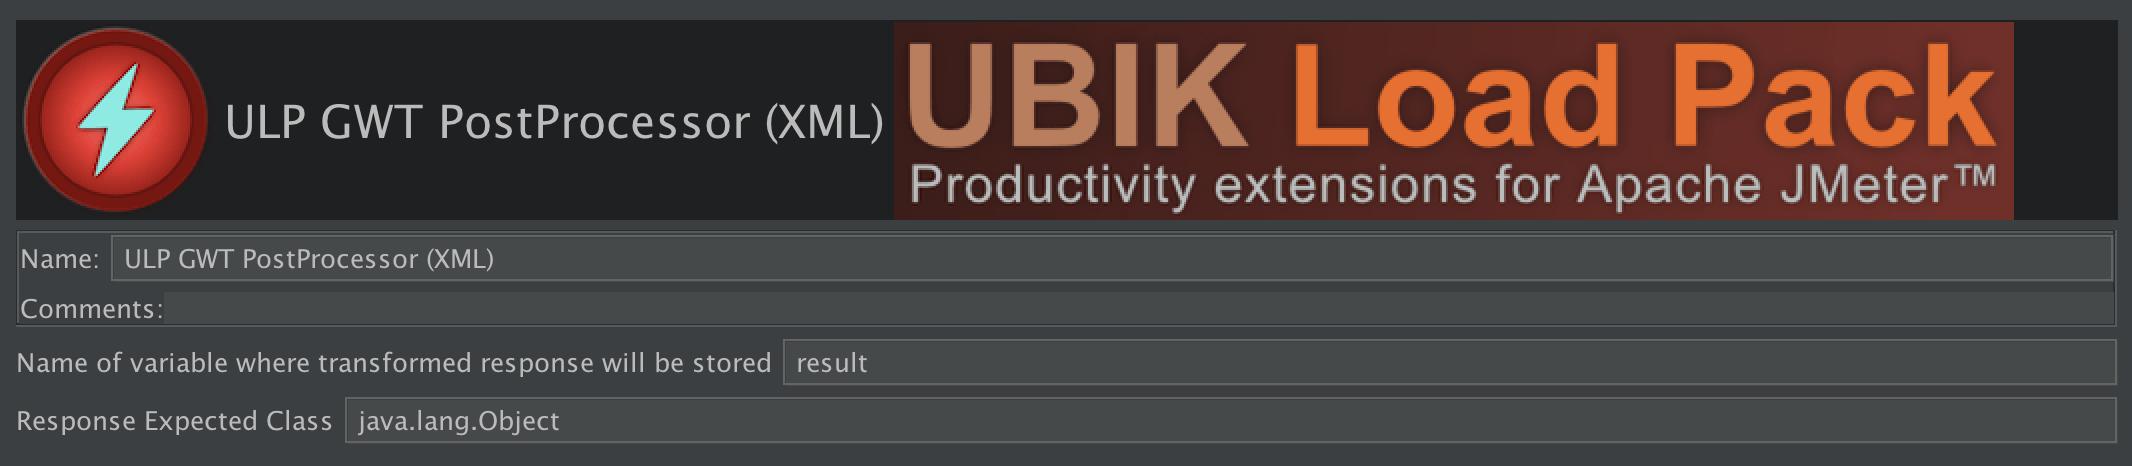 ULP GWT PostProcessor